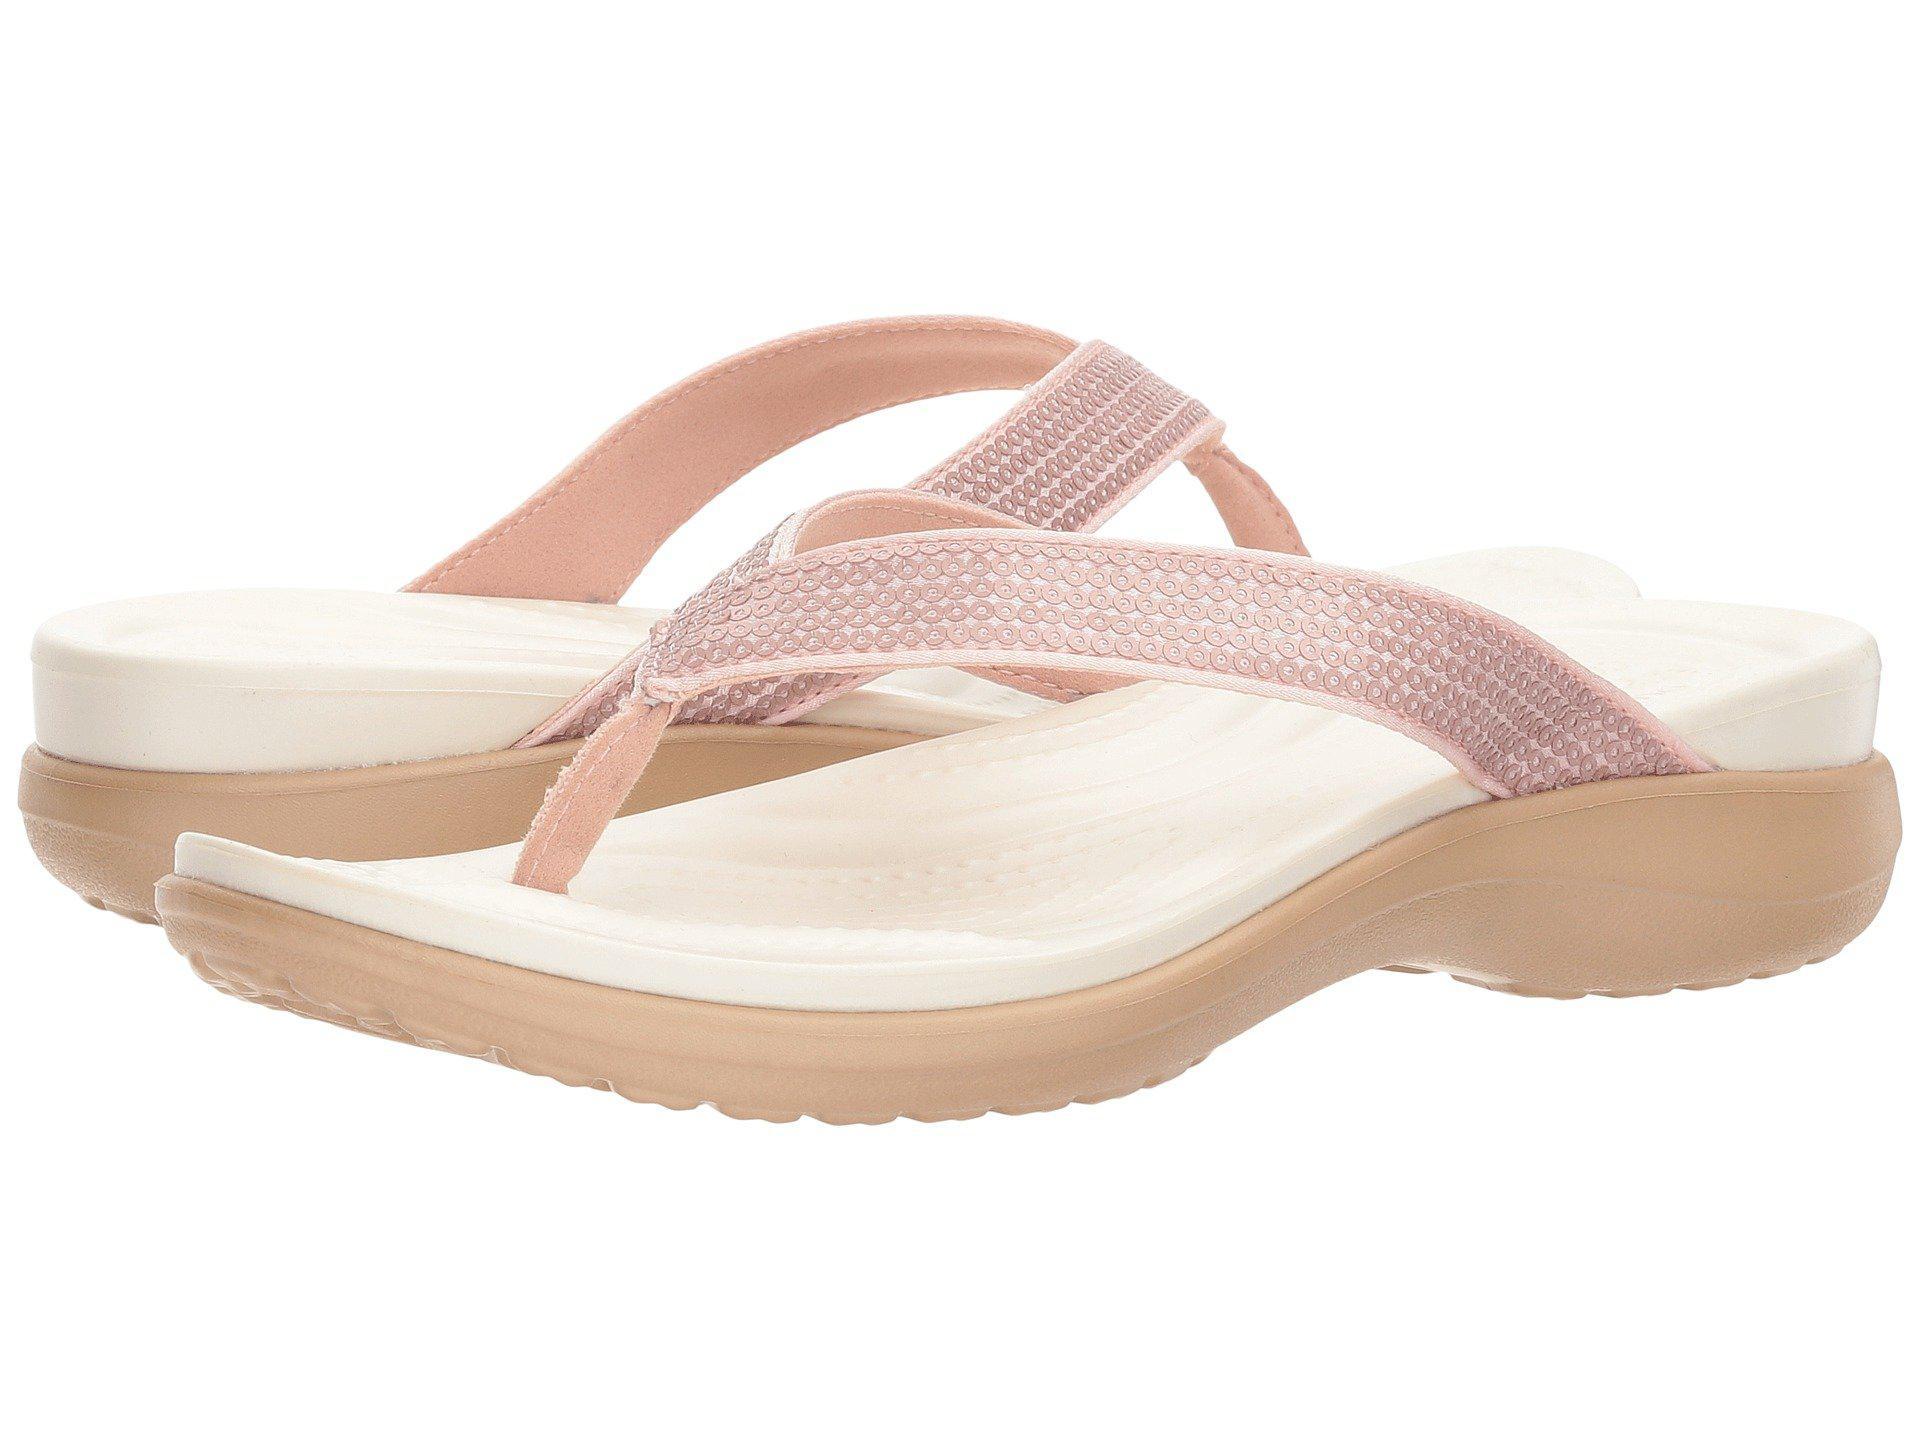 d030ddf81cd Lyst - Crocs™ Capri V Sequin in Pink - Save 56%